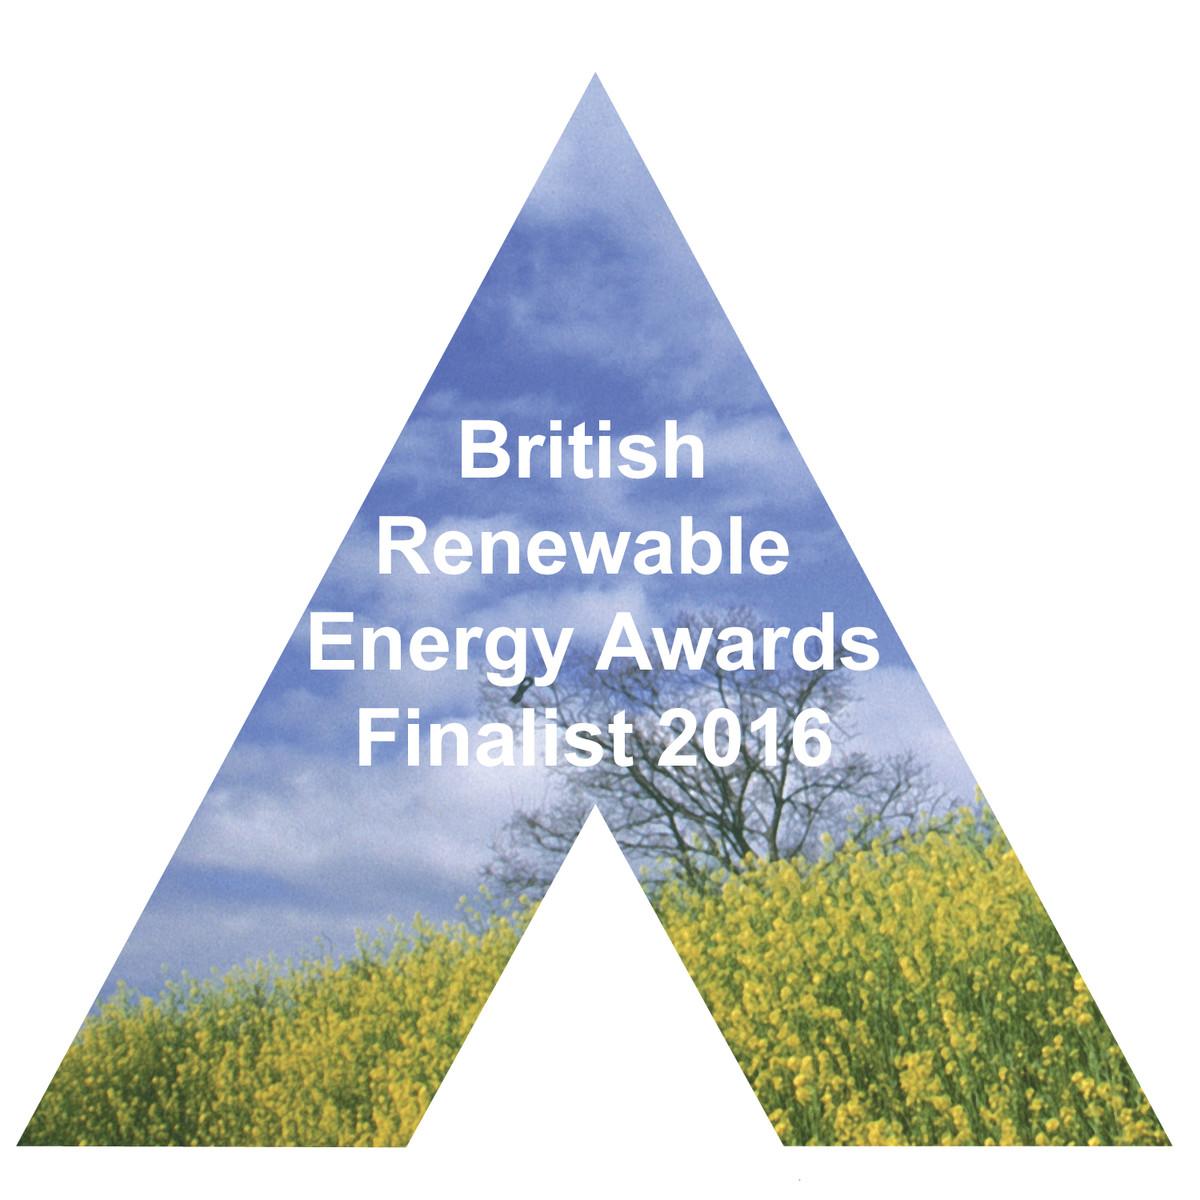 British Renewable Energy Awards 2016 finalist